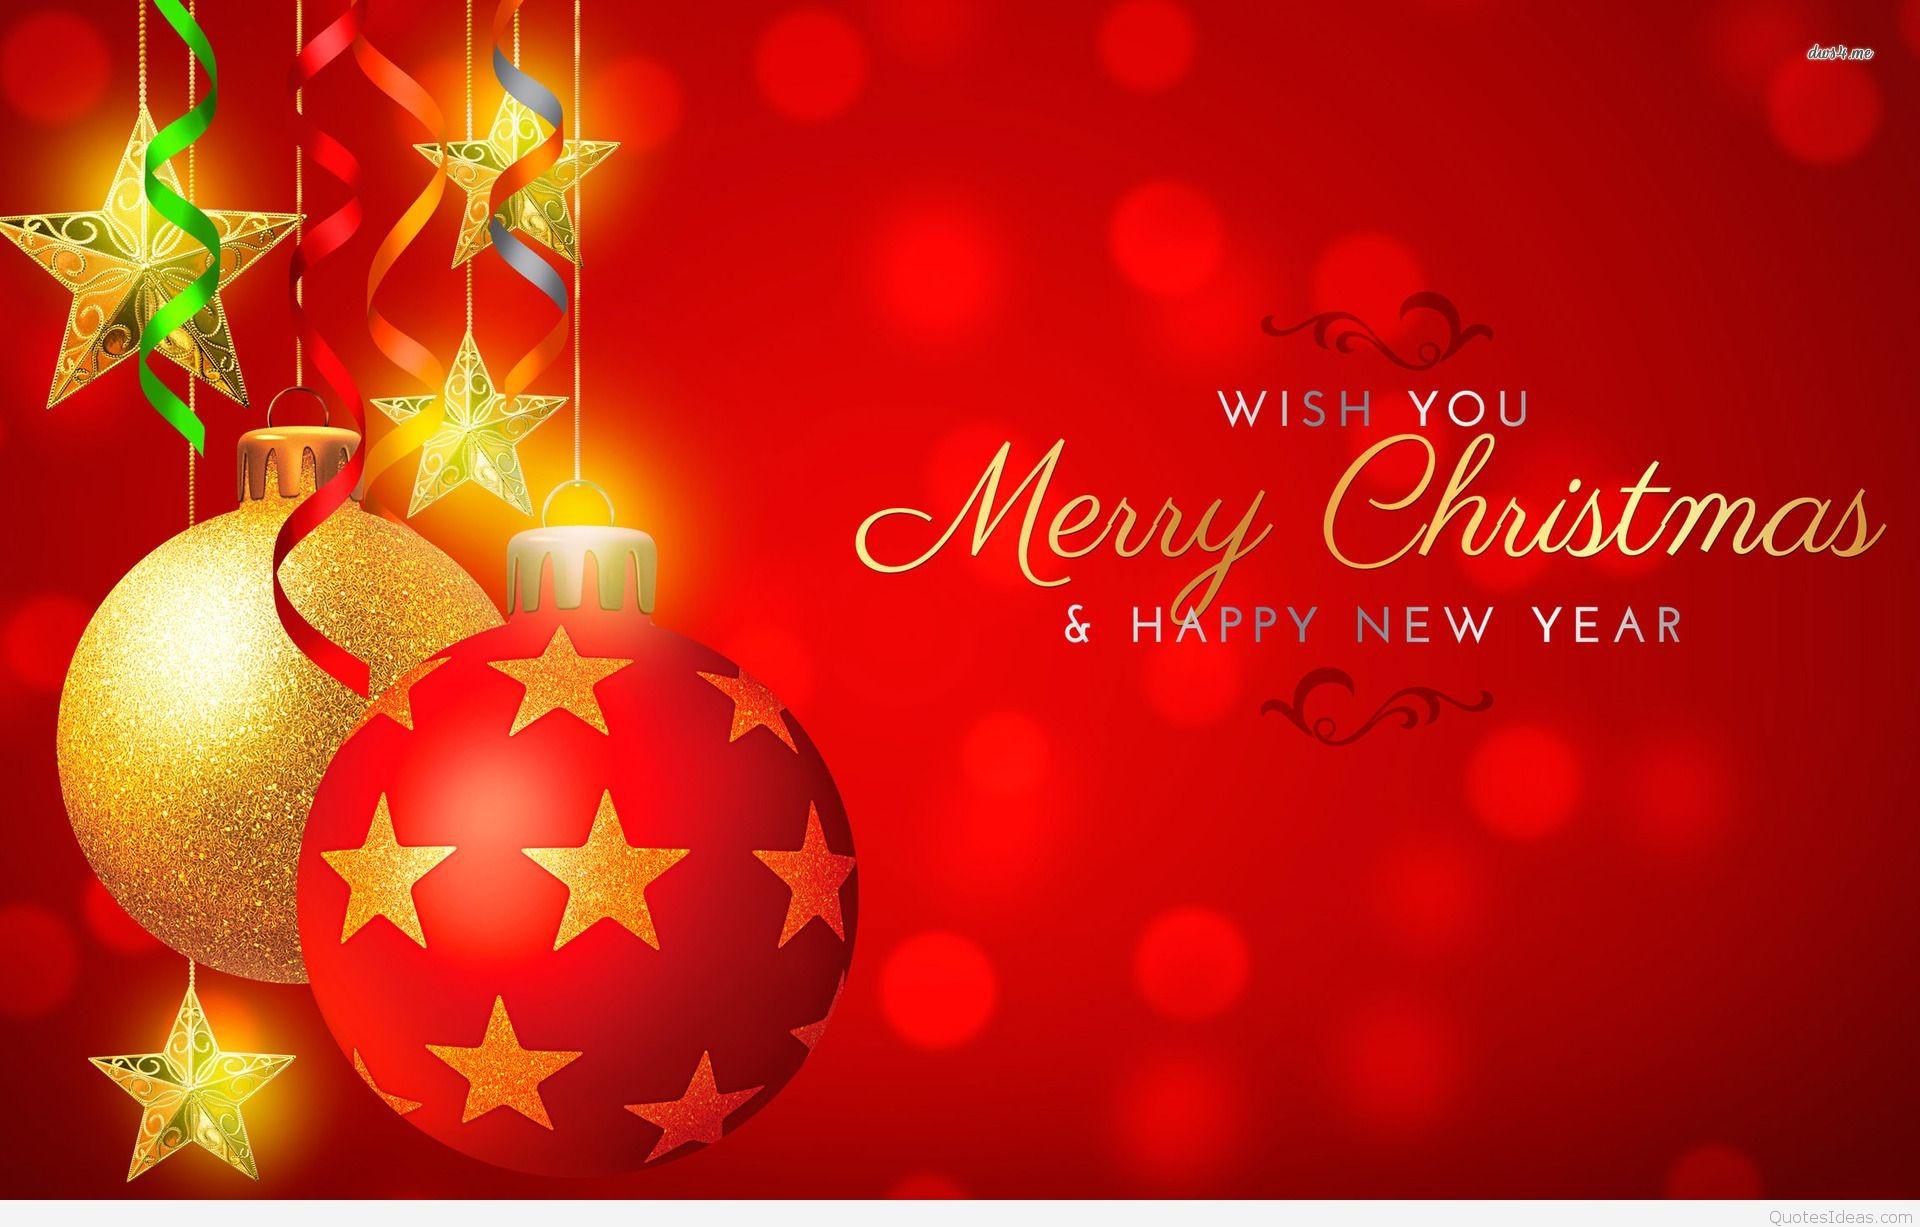 28961-merry-christmas-1920×1200-holiday-wallpaper.  d67d9da12c2eacdc72568c5b431b63a3